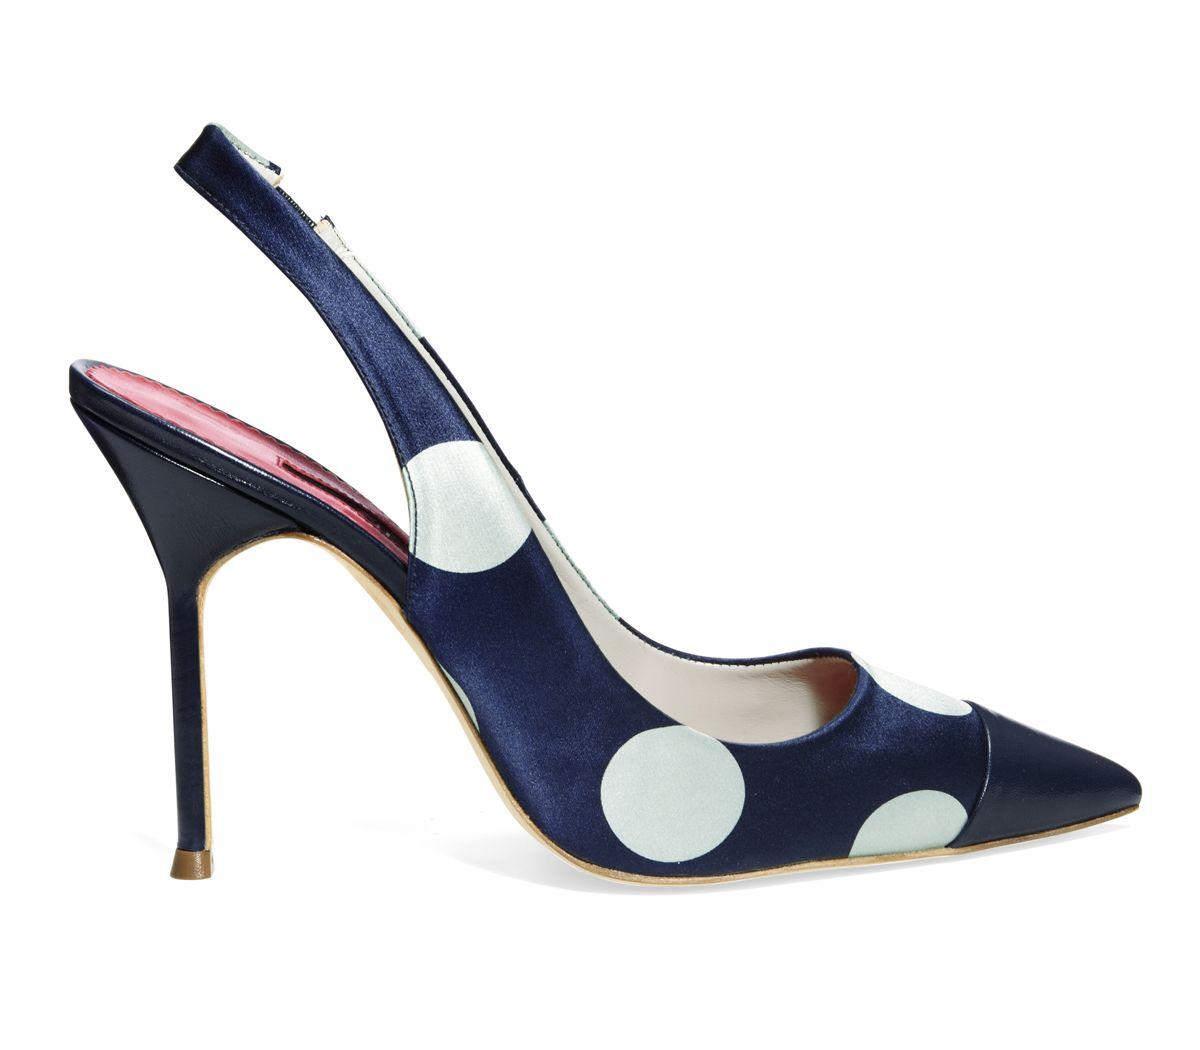 Carolina Herrera Polka Dot Slingback Pump - Love me my polka dot shoes!